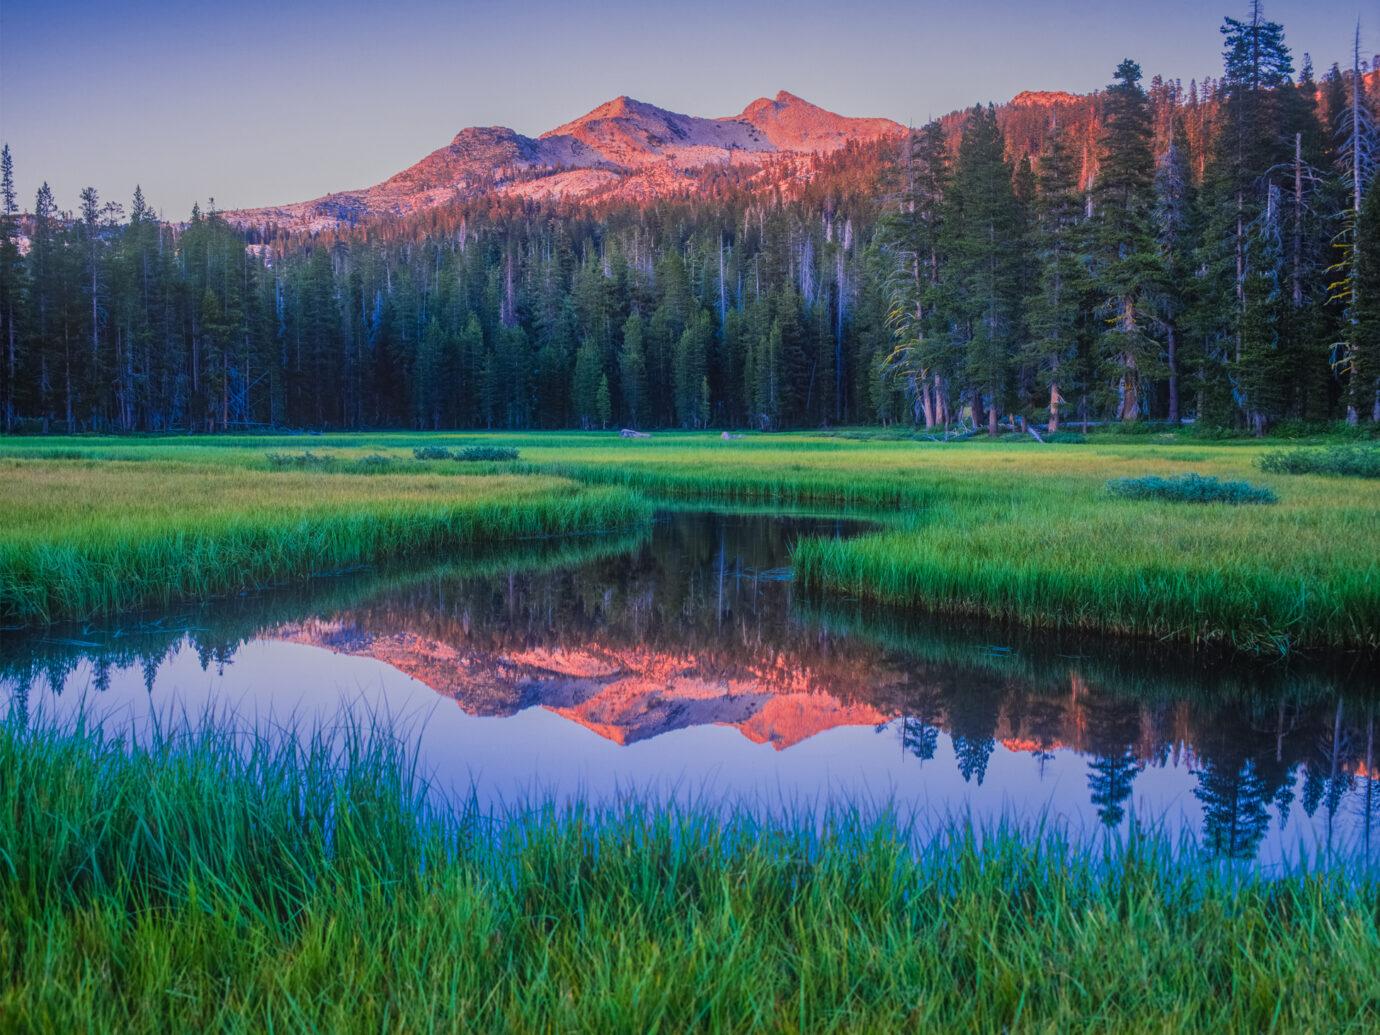 near Lake Tahoe, serene destination, early morning on the lake, refreshing, fresh start, calm water